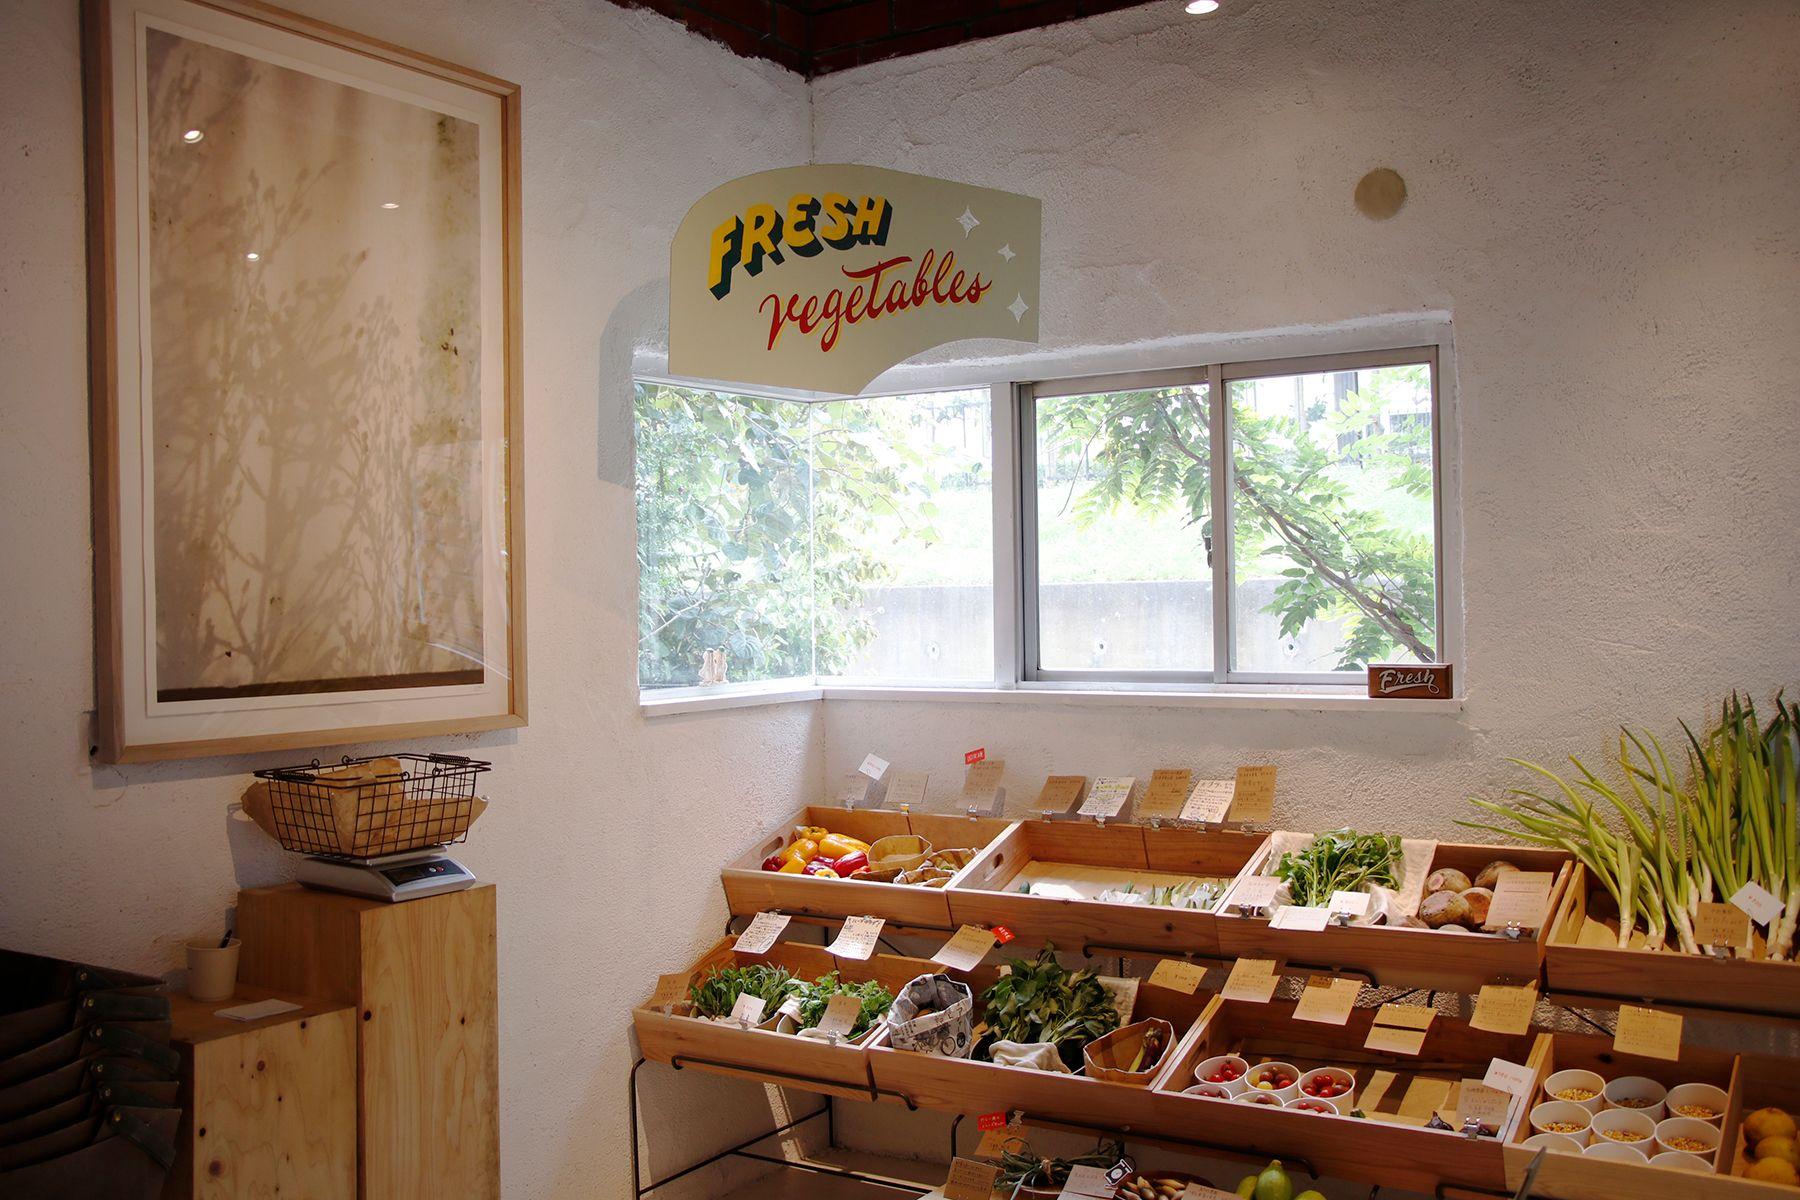 micotoya house (アイス屋/青果屋/shop)サインペイントの看板